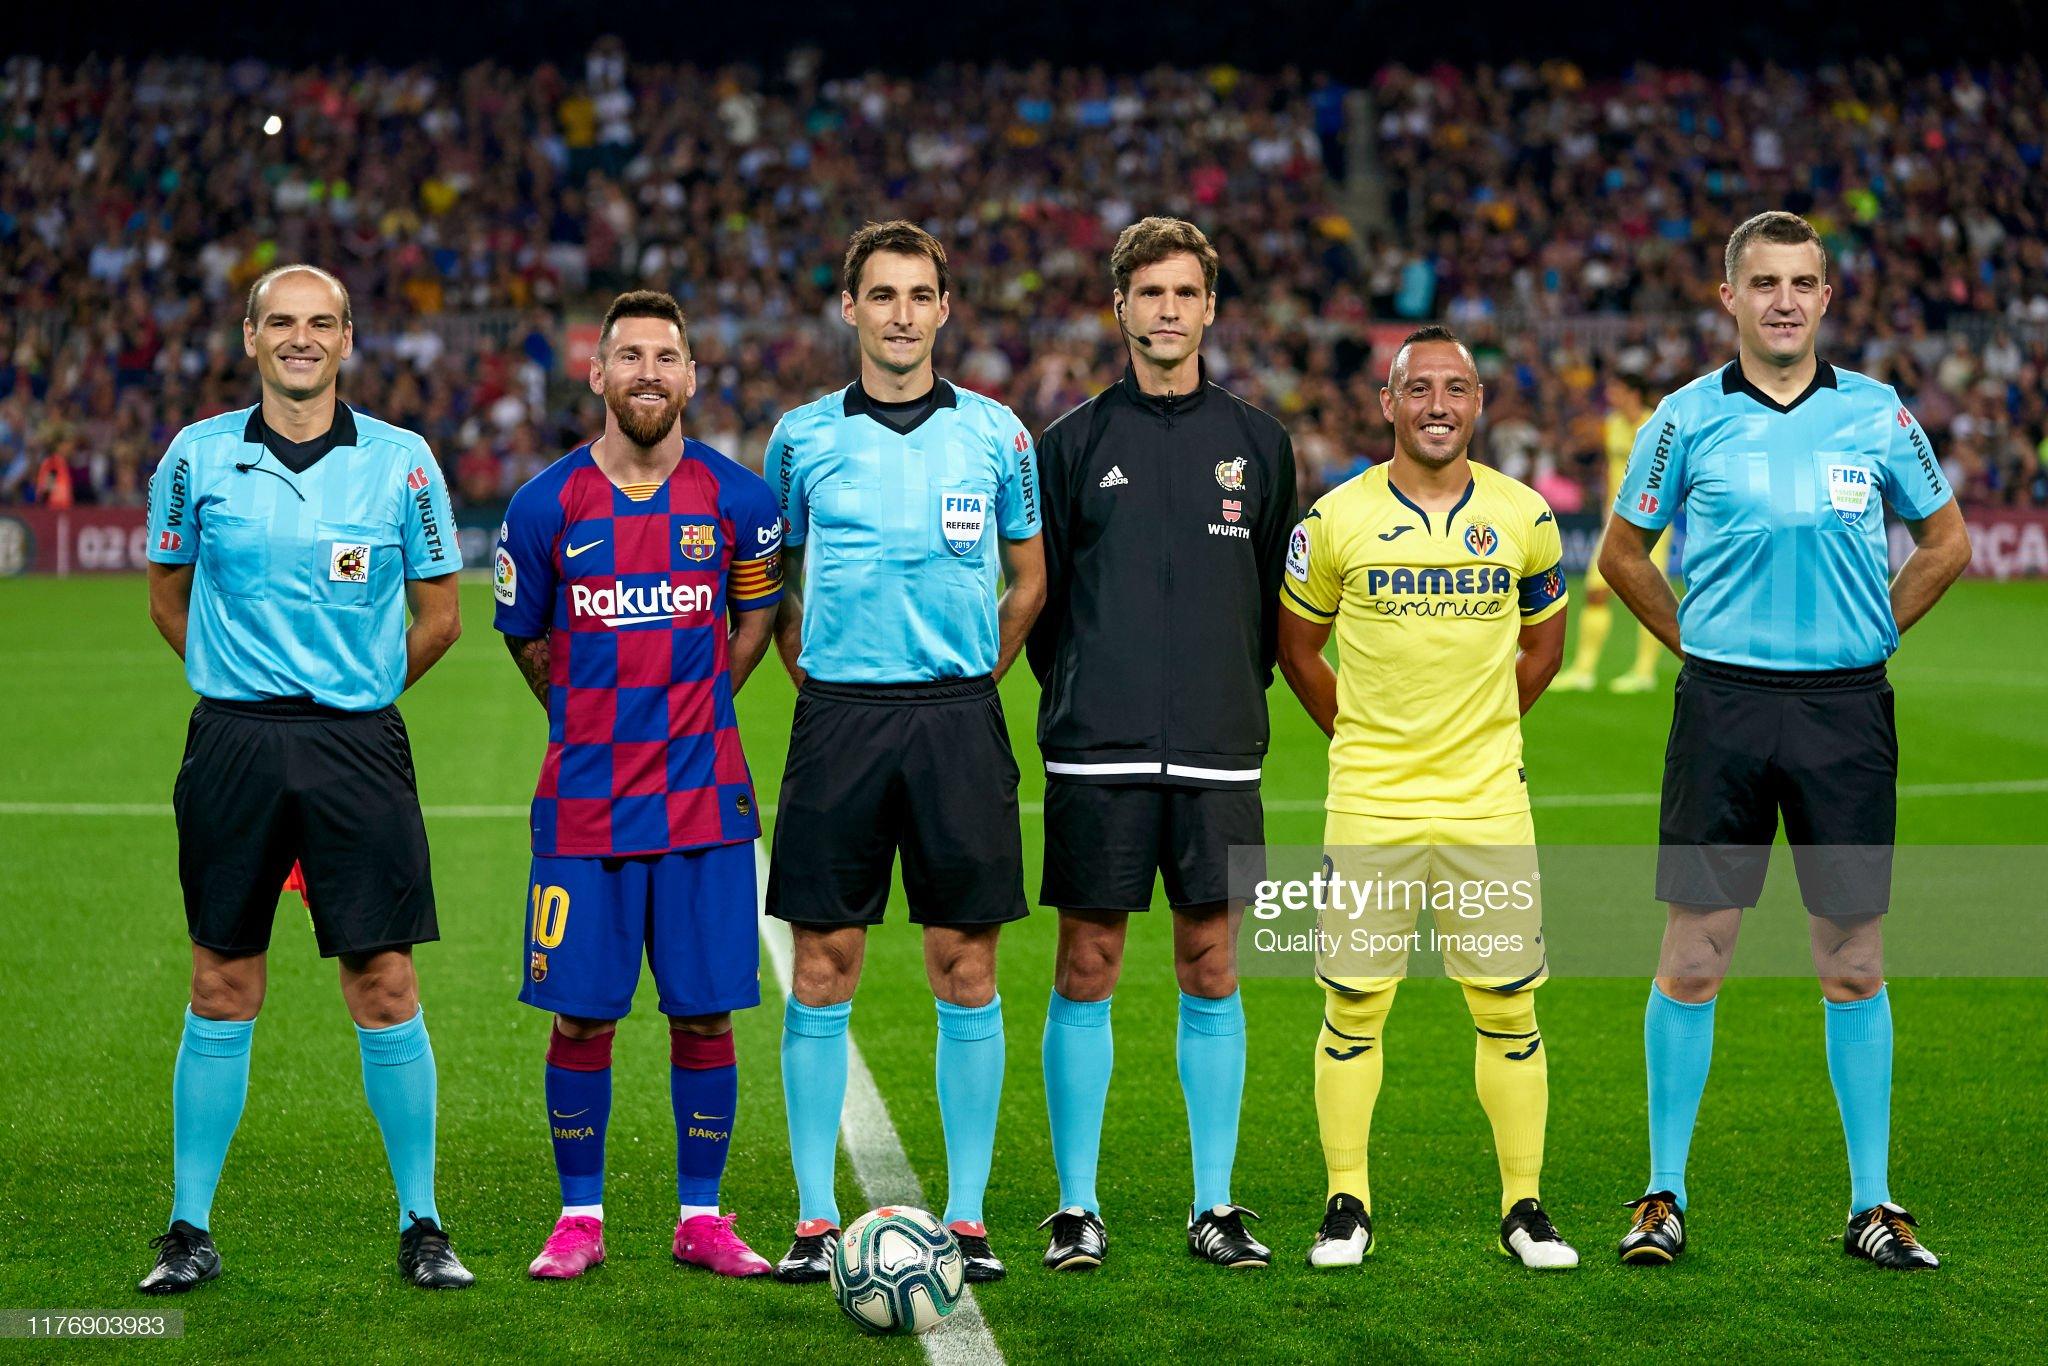 صور مباراة : برشلونة - فياريال 2-1 ( 24-09-2019 )  Lionel-messi-of-fc-barcelona-and-santi-cazorla-of-villarreal-cf-pose-picture-id1176903983?s=2048x2048